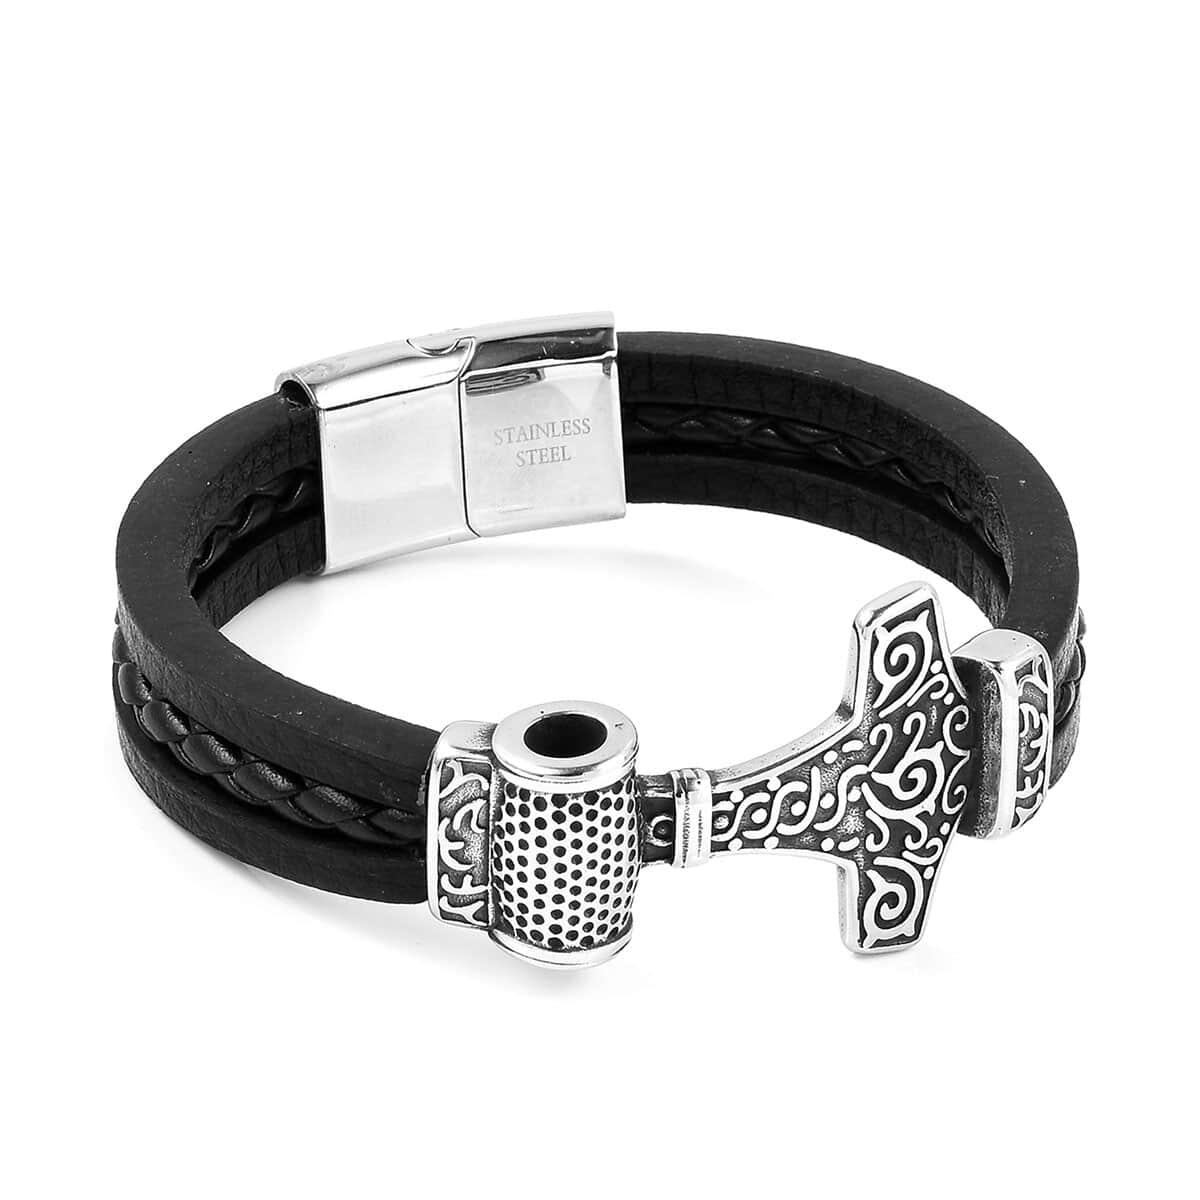 17b8f5eefb5 Black Triple Strand Oxidized Microfiber Leather, Stainless Steel Anchor  Bracelet (8.50 In)